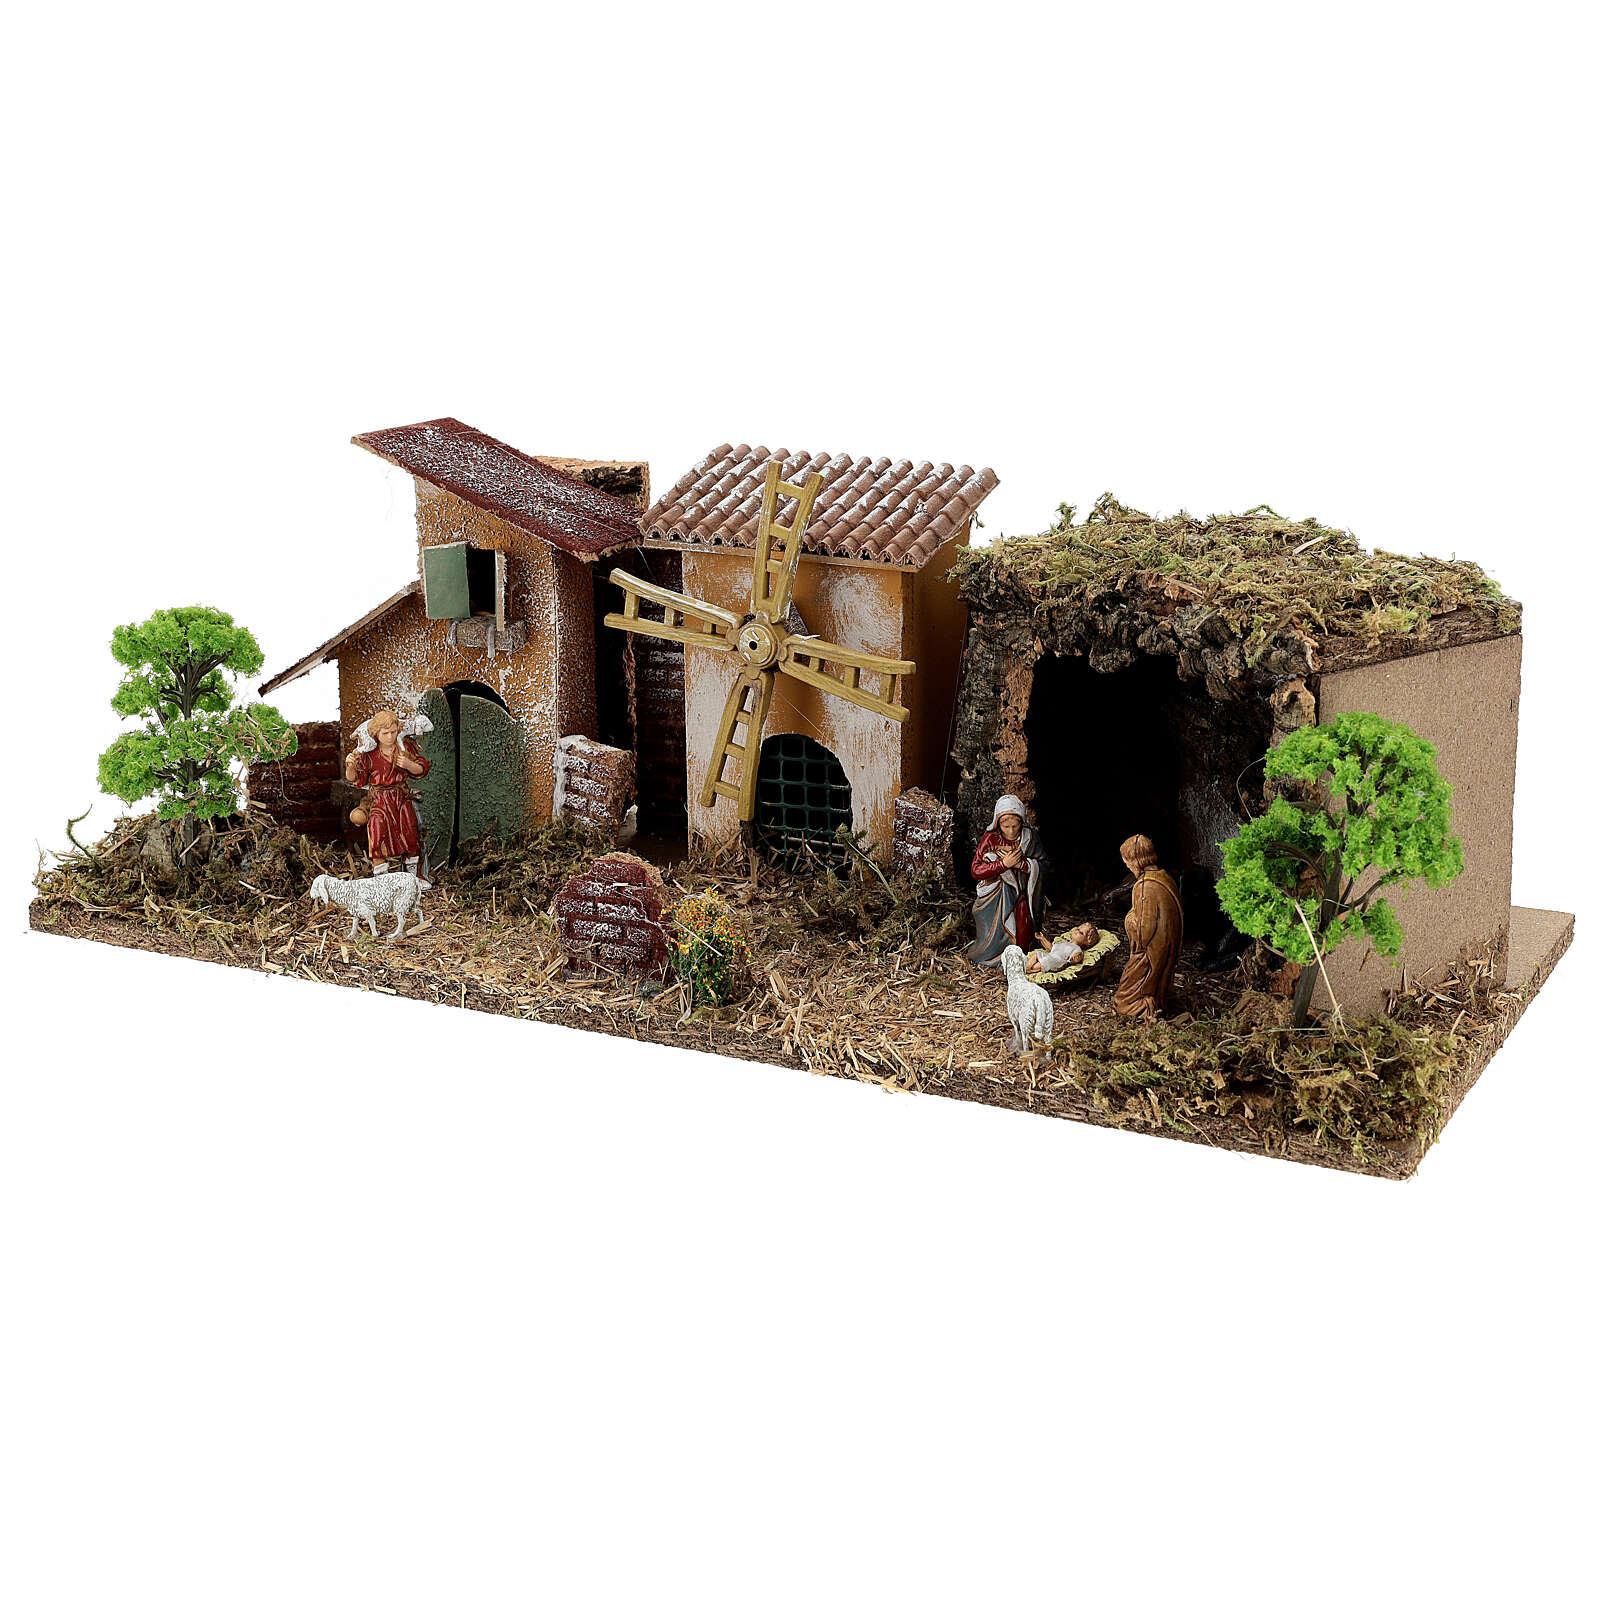 Village with Nativity scene, Moranduzzo 8-10 cm 20x55x25 cm 4